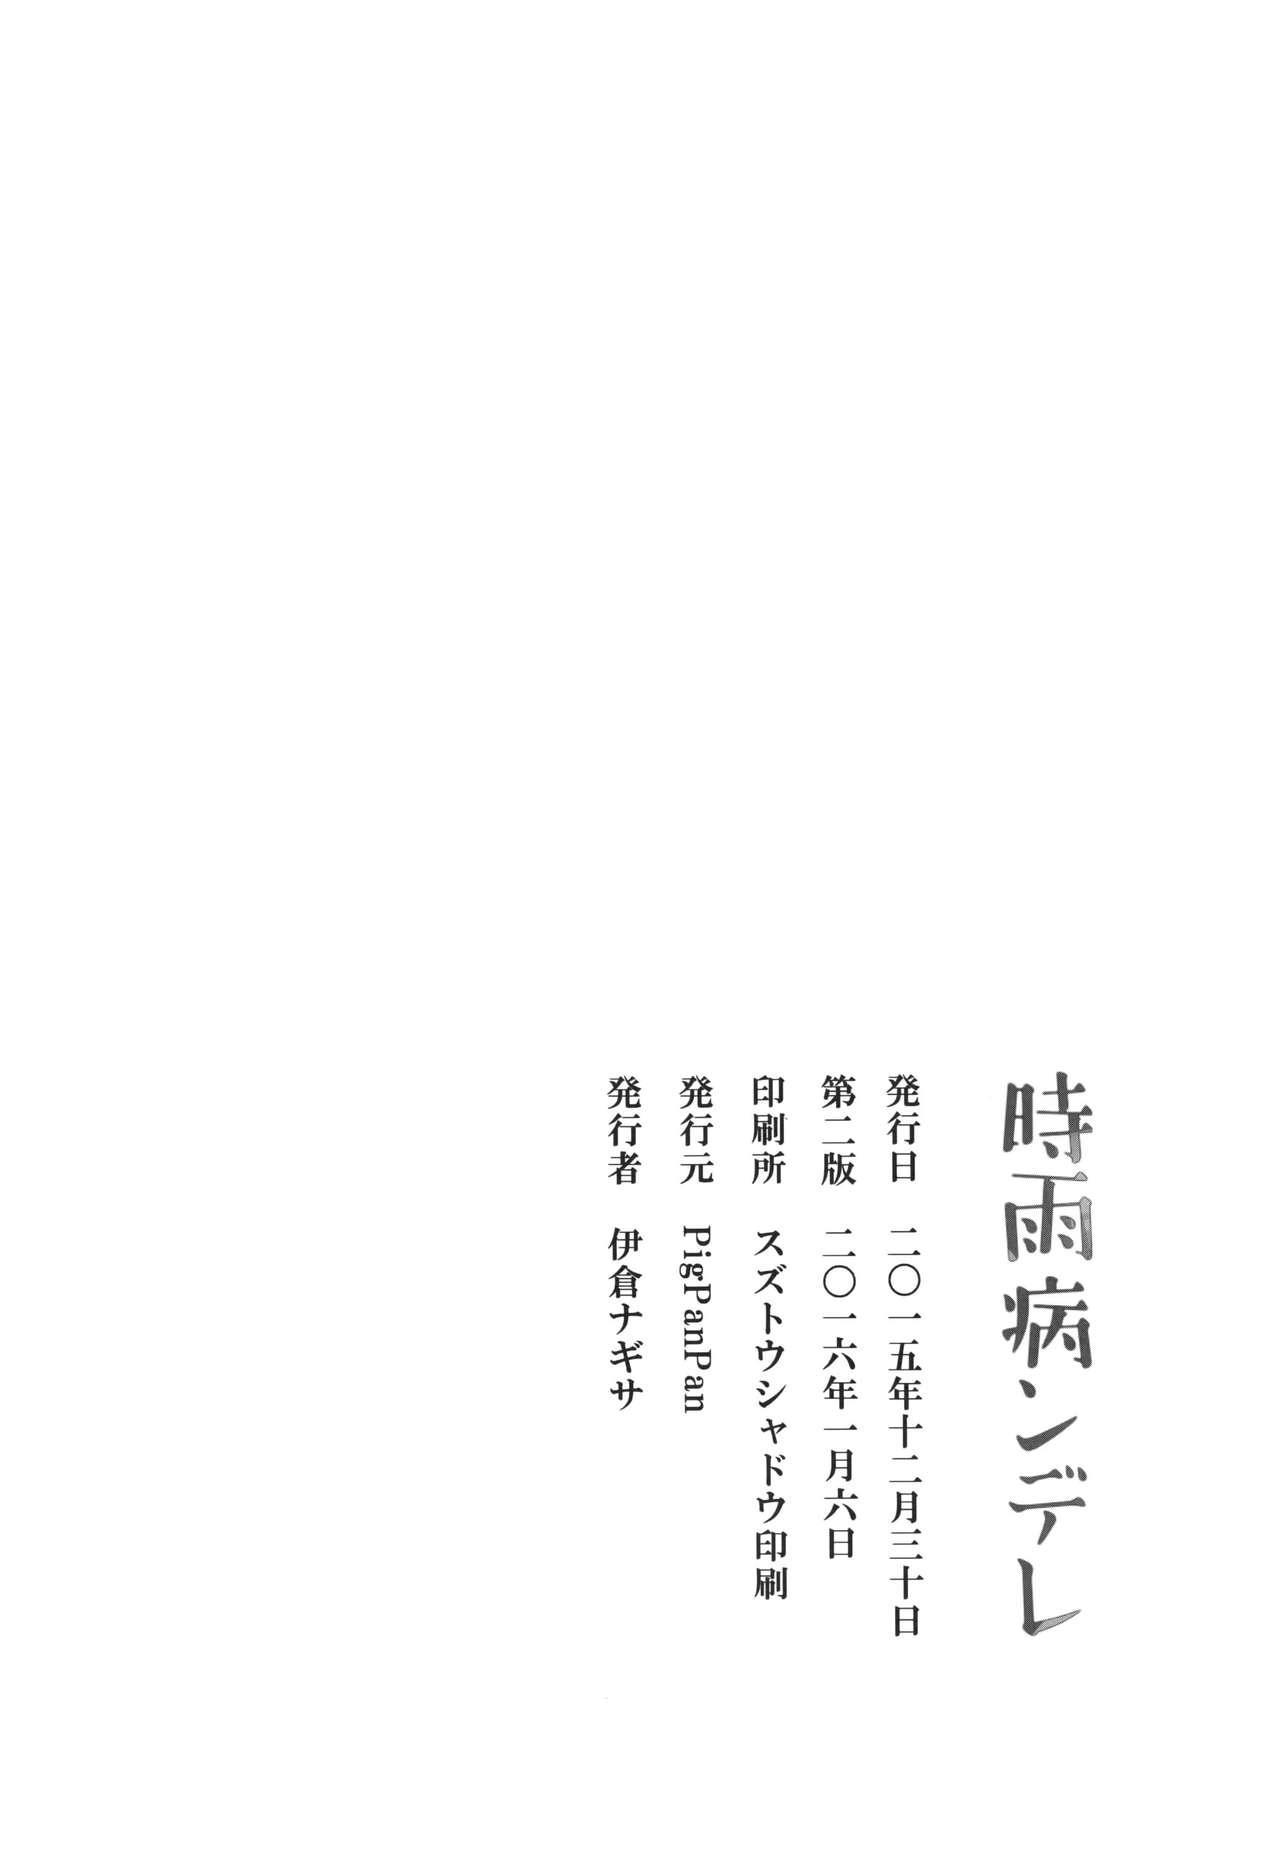 Shigure Yandere 29